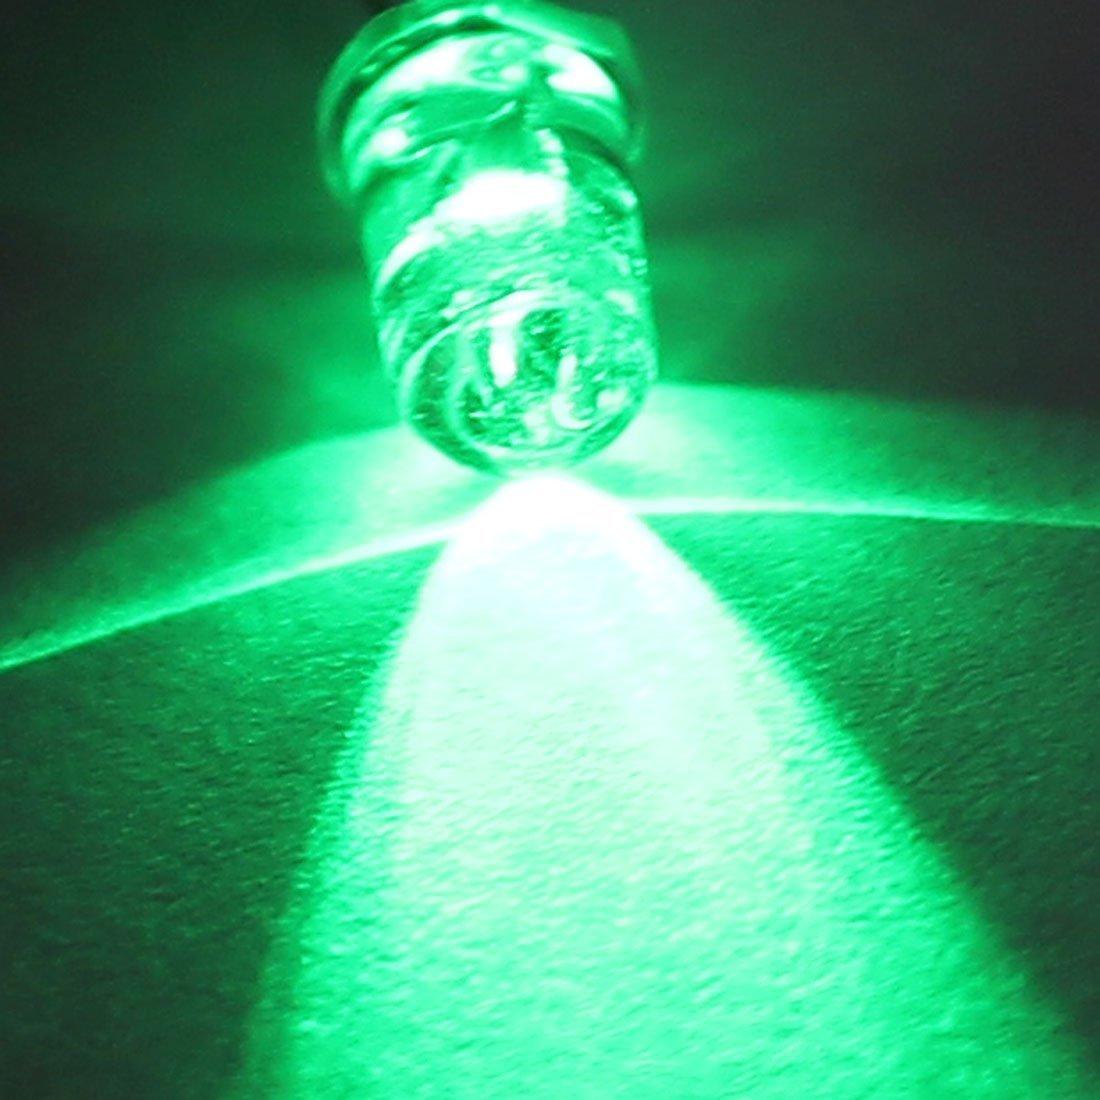 5 mm LED transparente eDealMax Lampe Cap 2 Borne Emitting Diodes frais Green Light